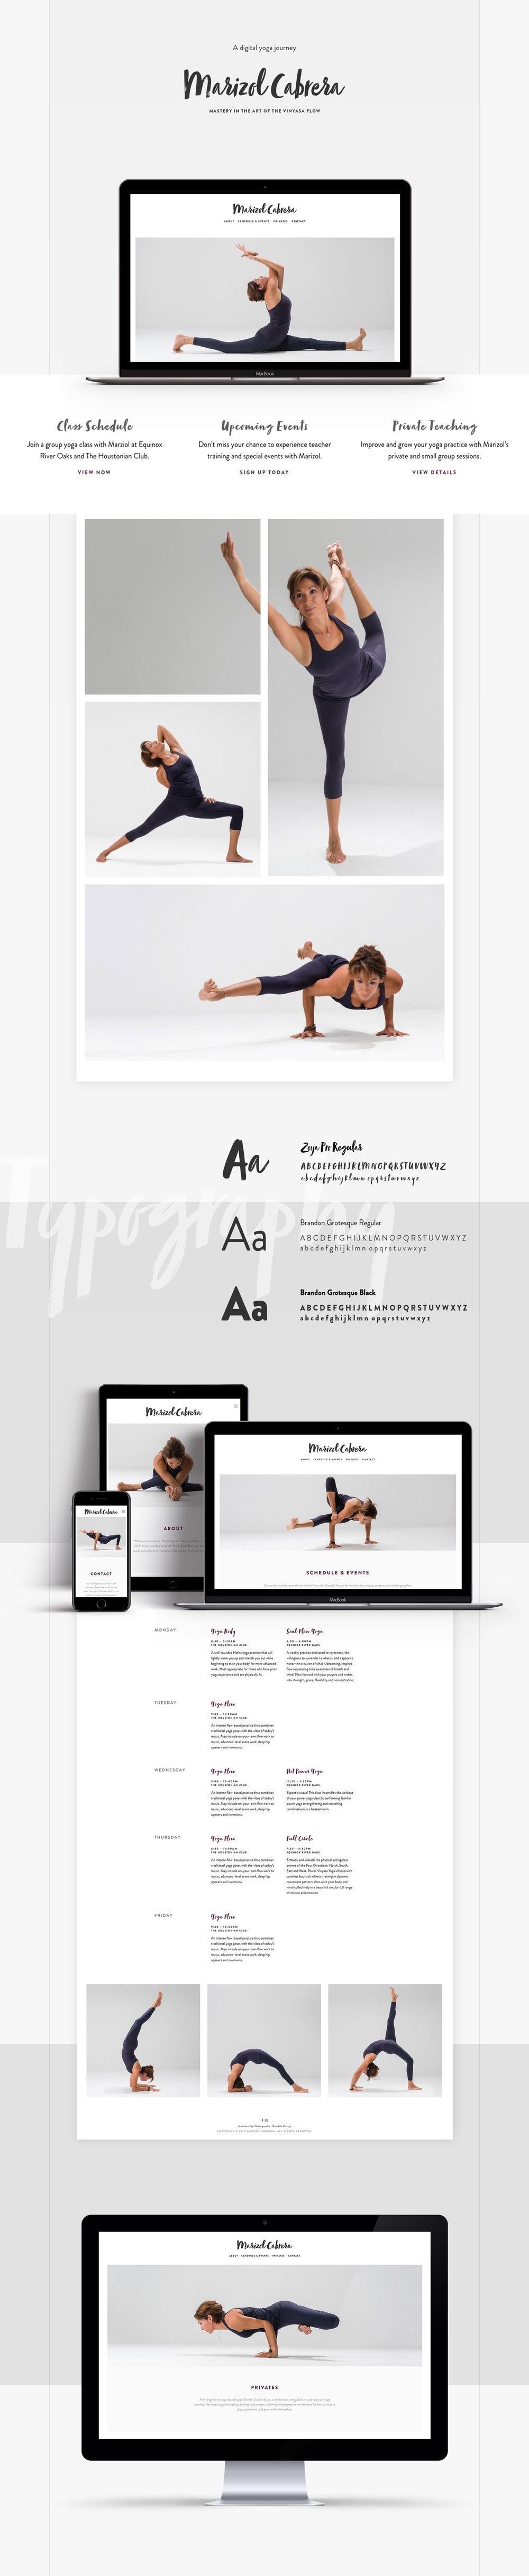 Marizol Cabrera Yoga - 01.jpg